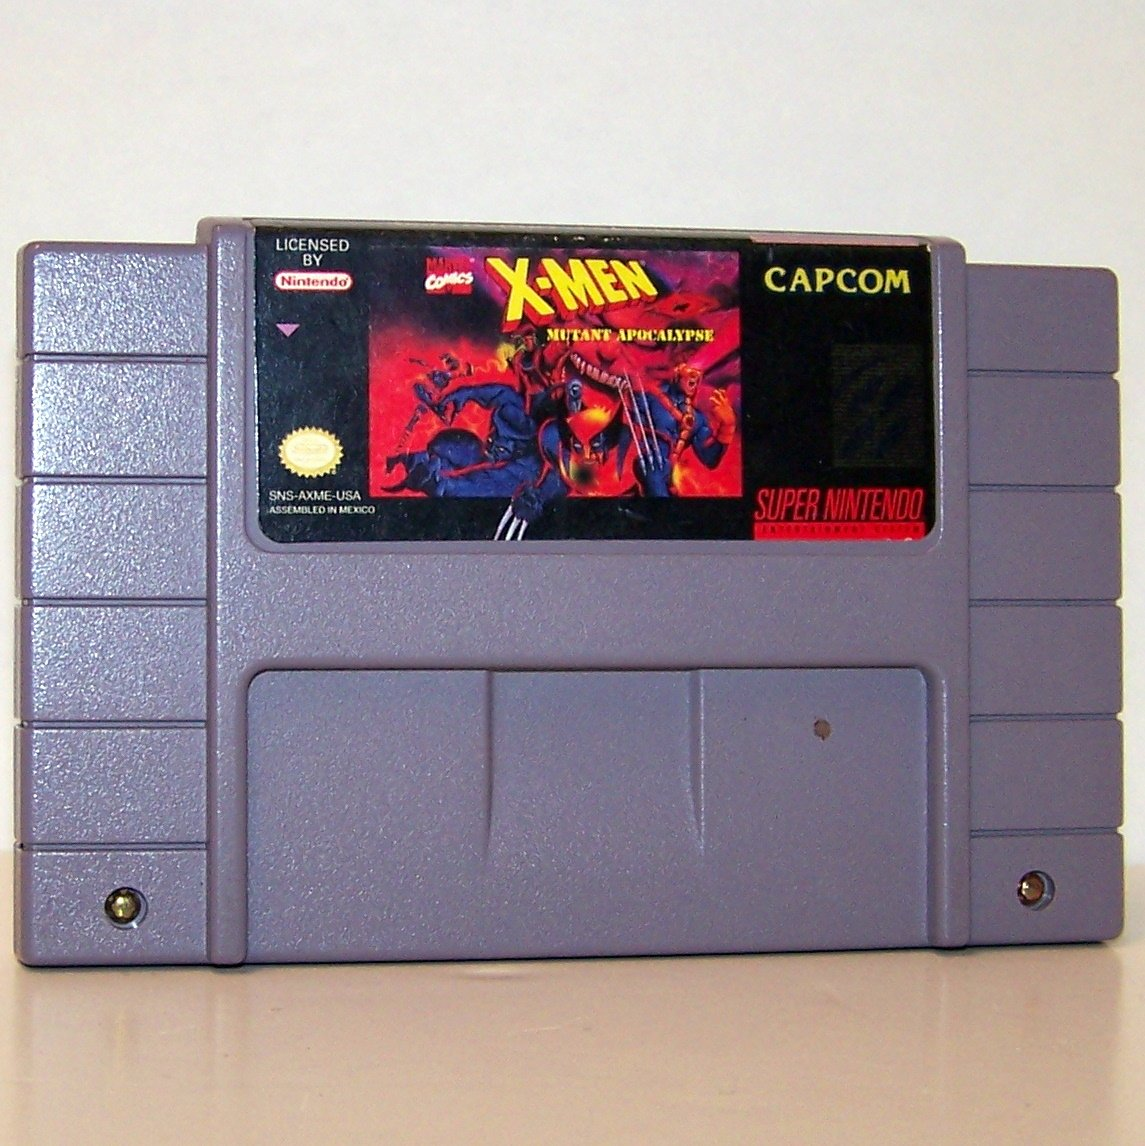 X-Men Mutant Apocalypse Super Nintendo Game Cartridge